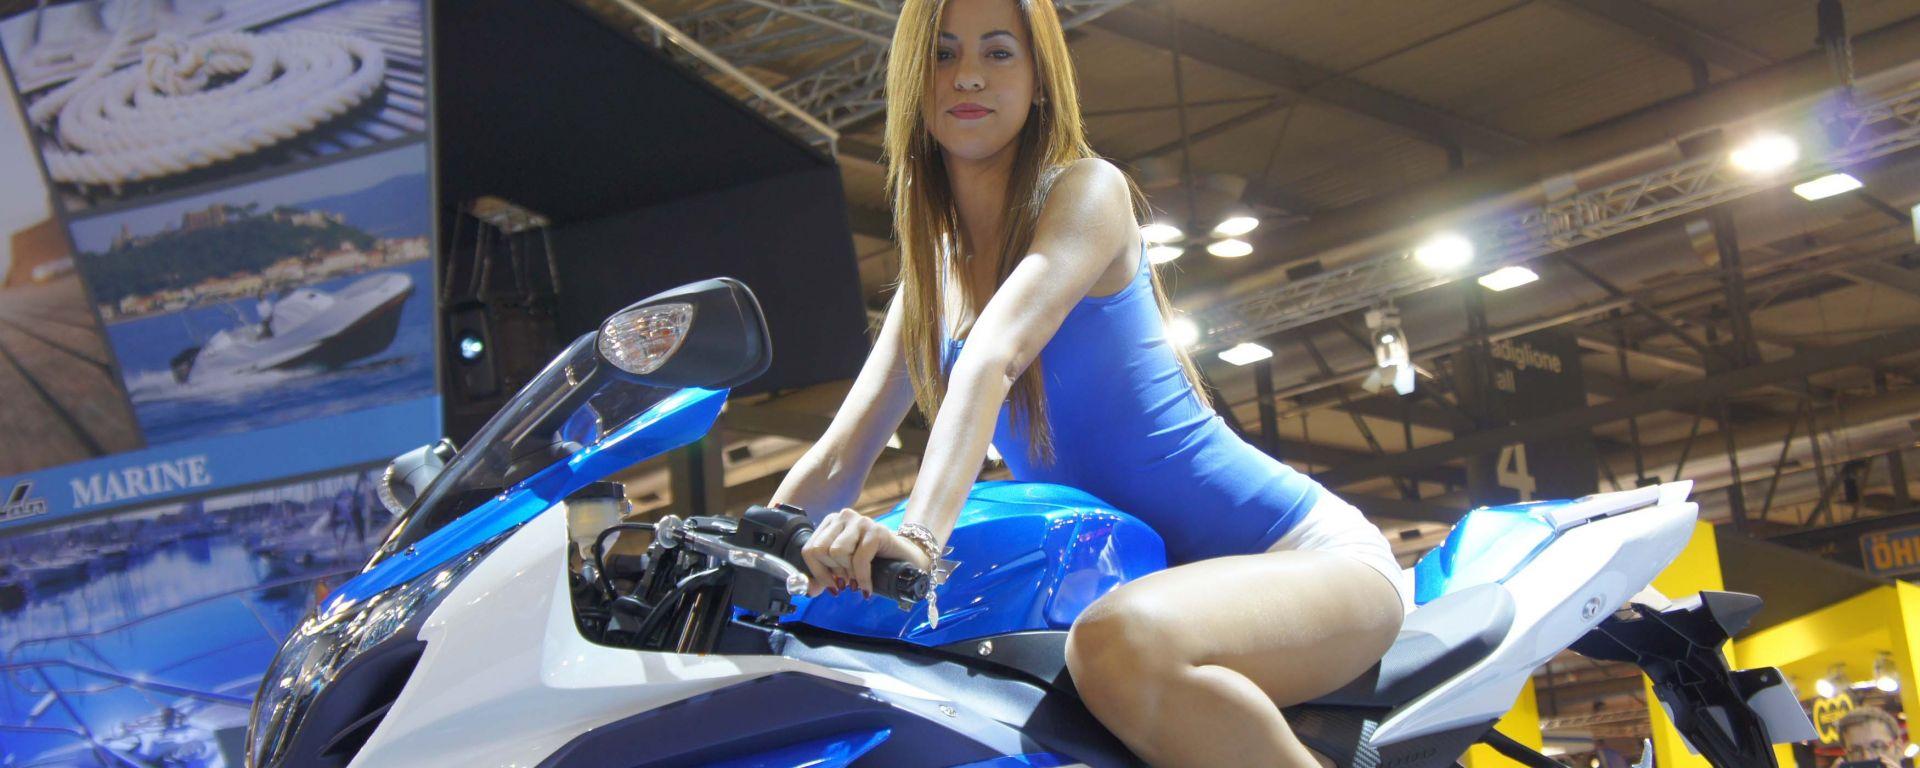 Eicma 2011: lo stand Suzuki